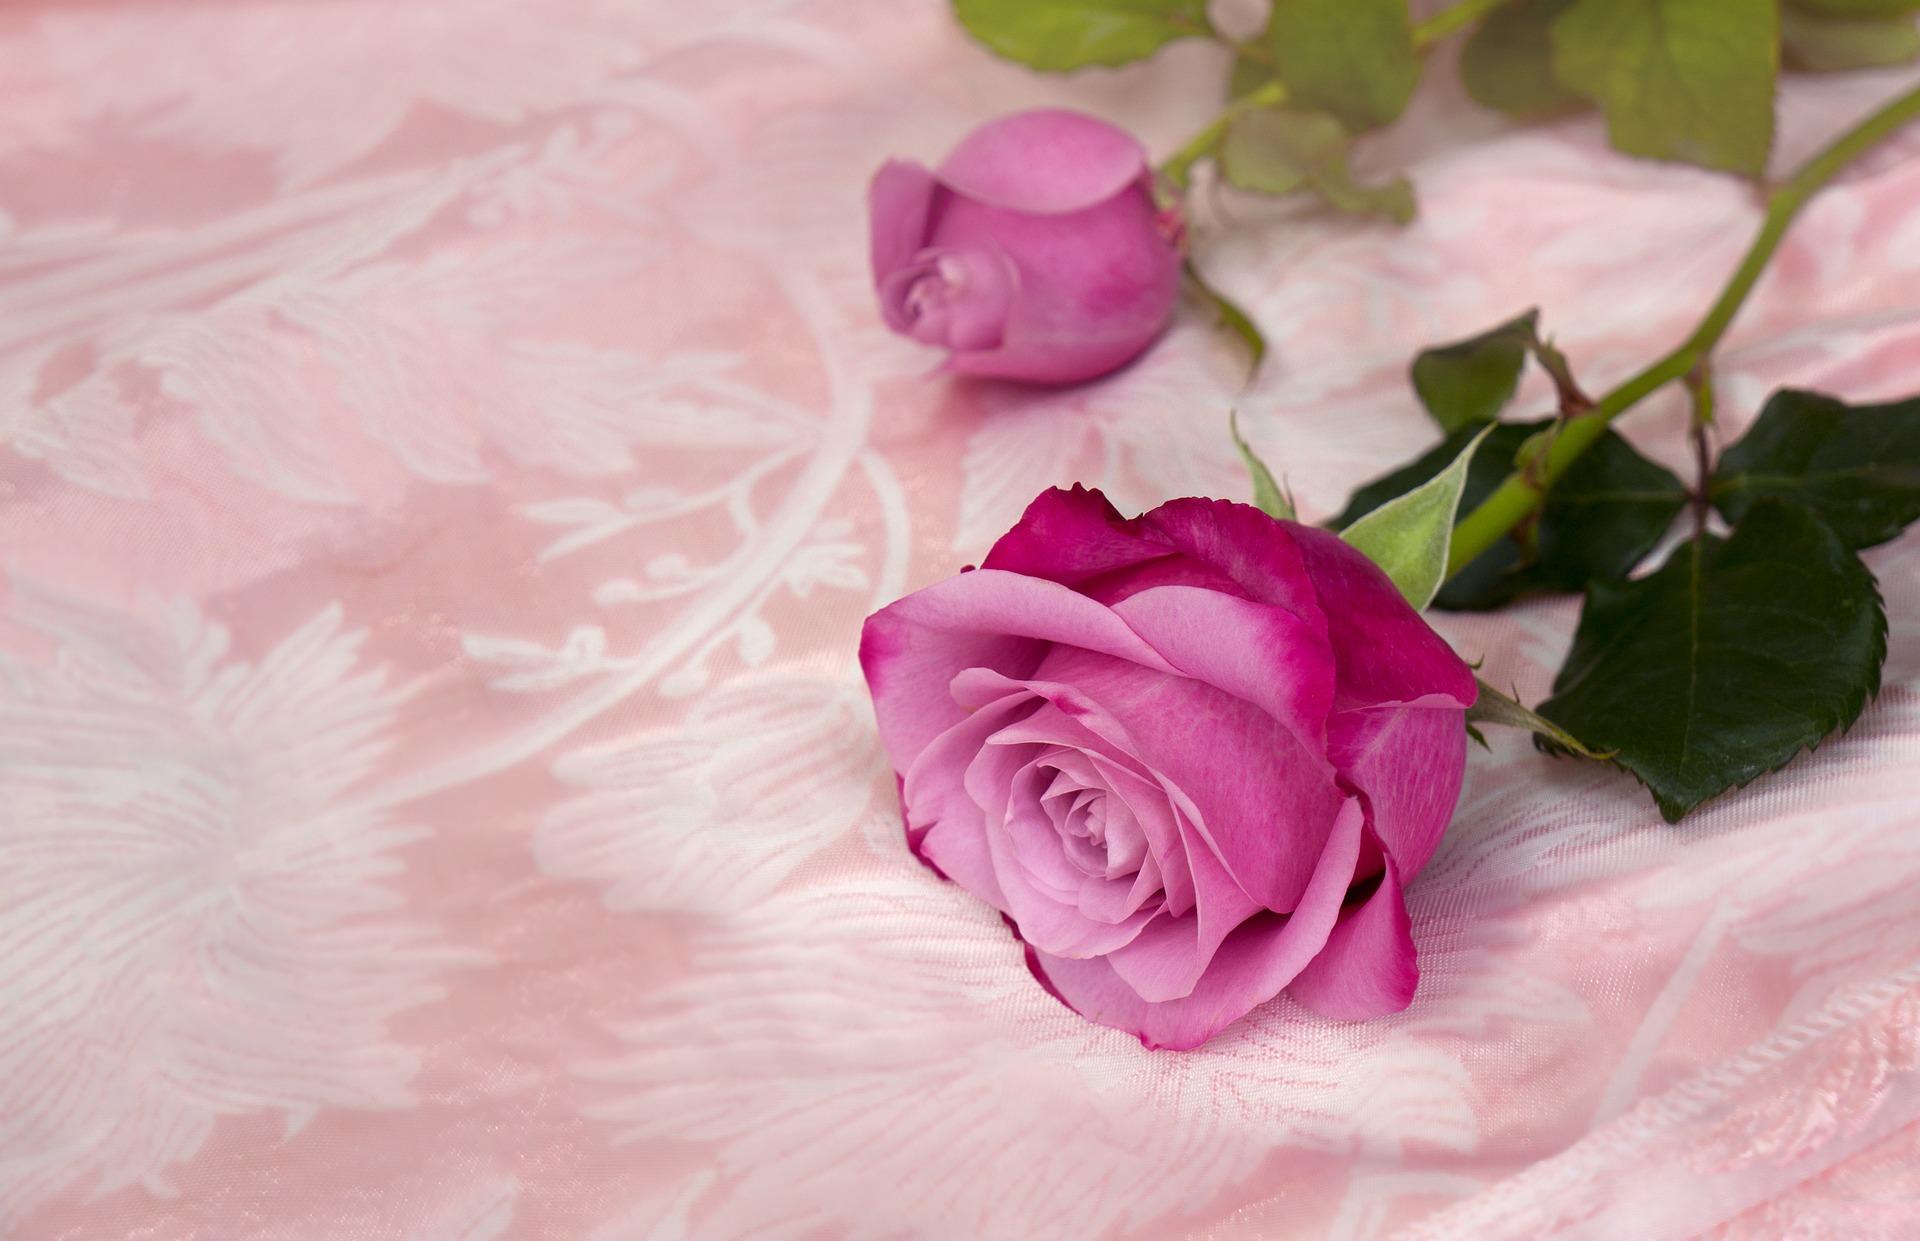 Rosa a cor do empoderamento feminino